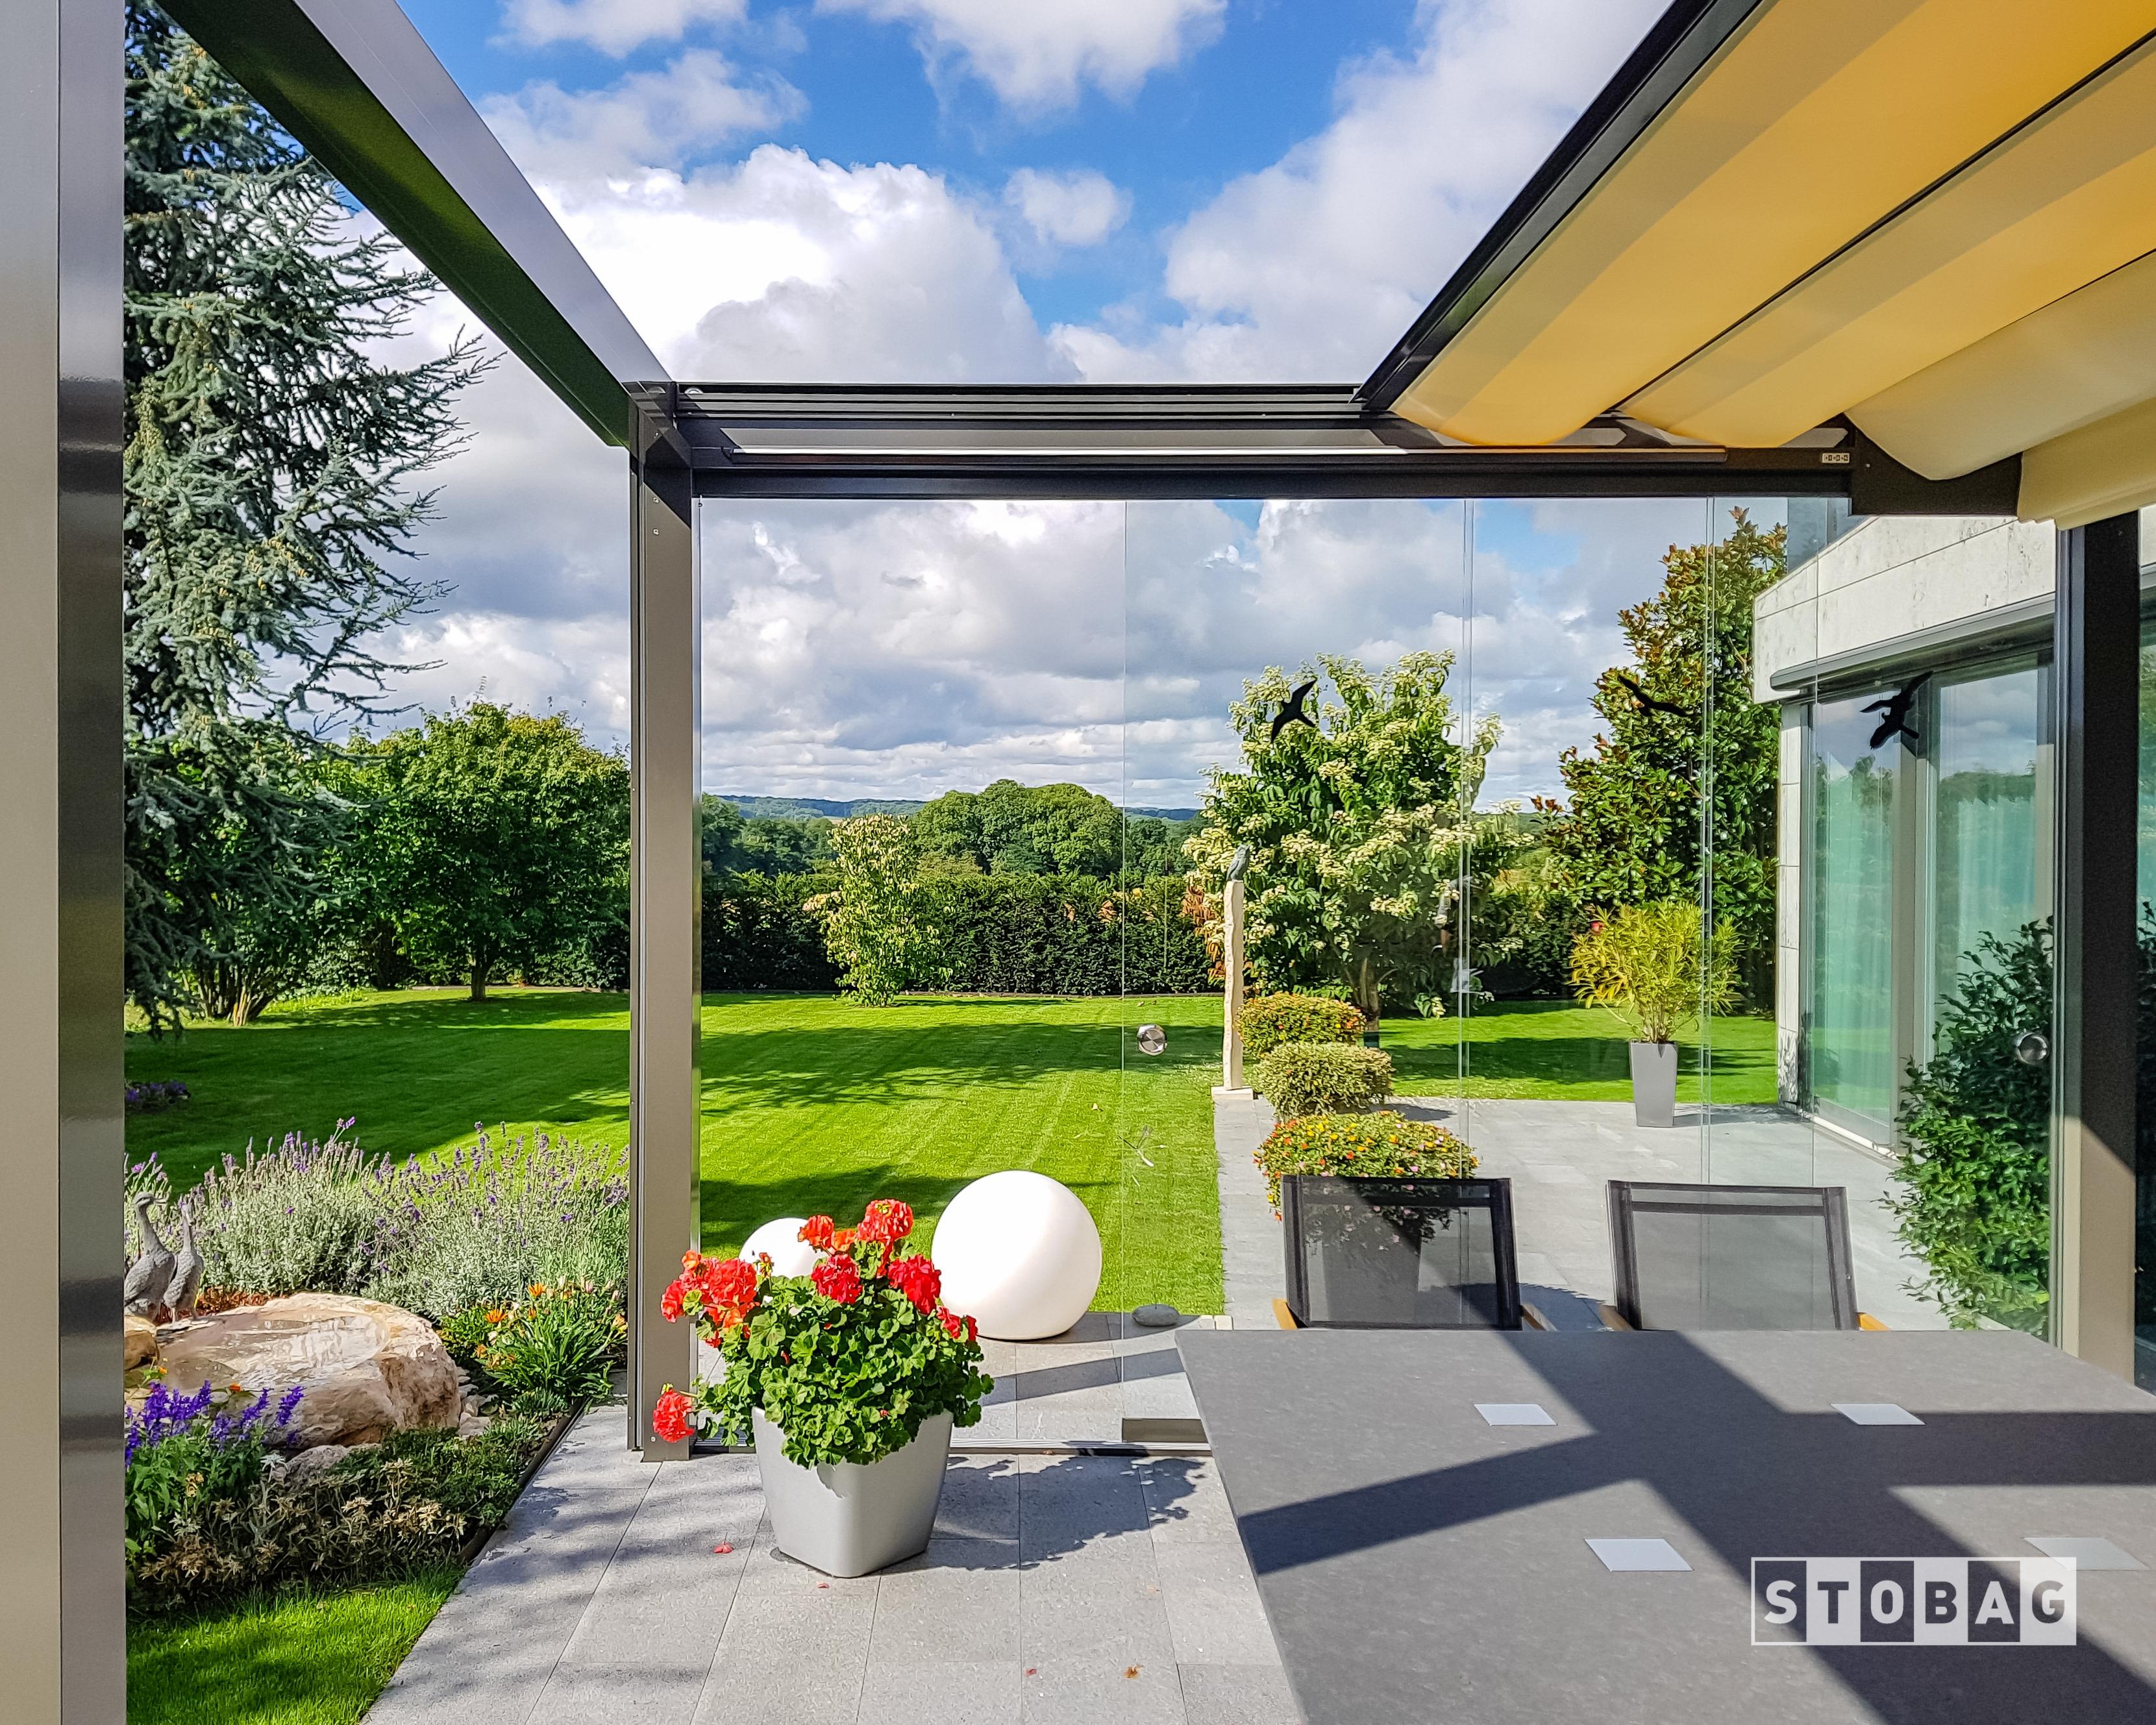 Hervorragend Faltdach Gartenpavillon - Bavona TP6100 | bowi.ch NX92